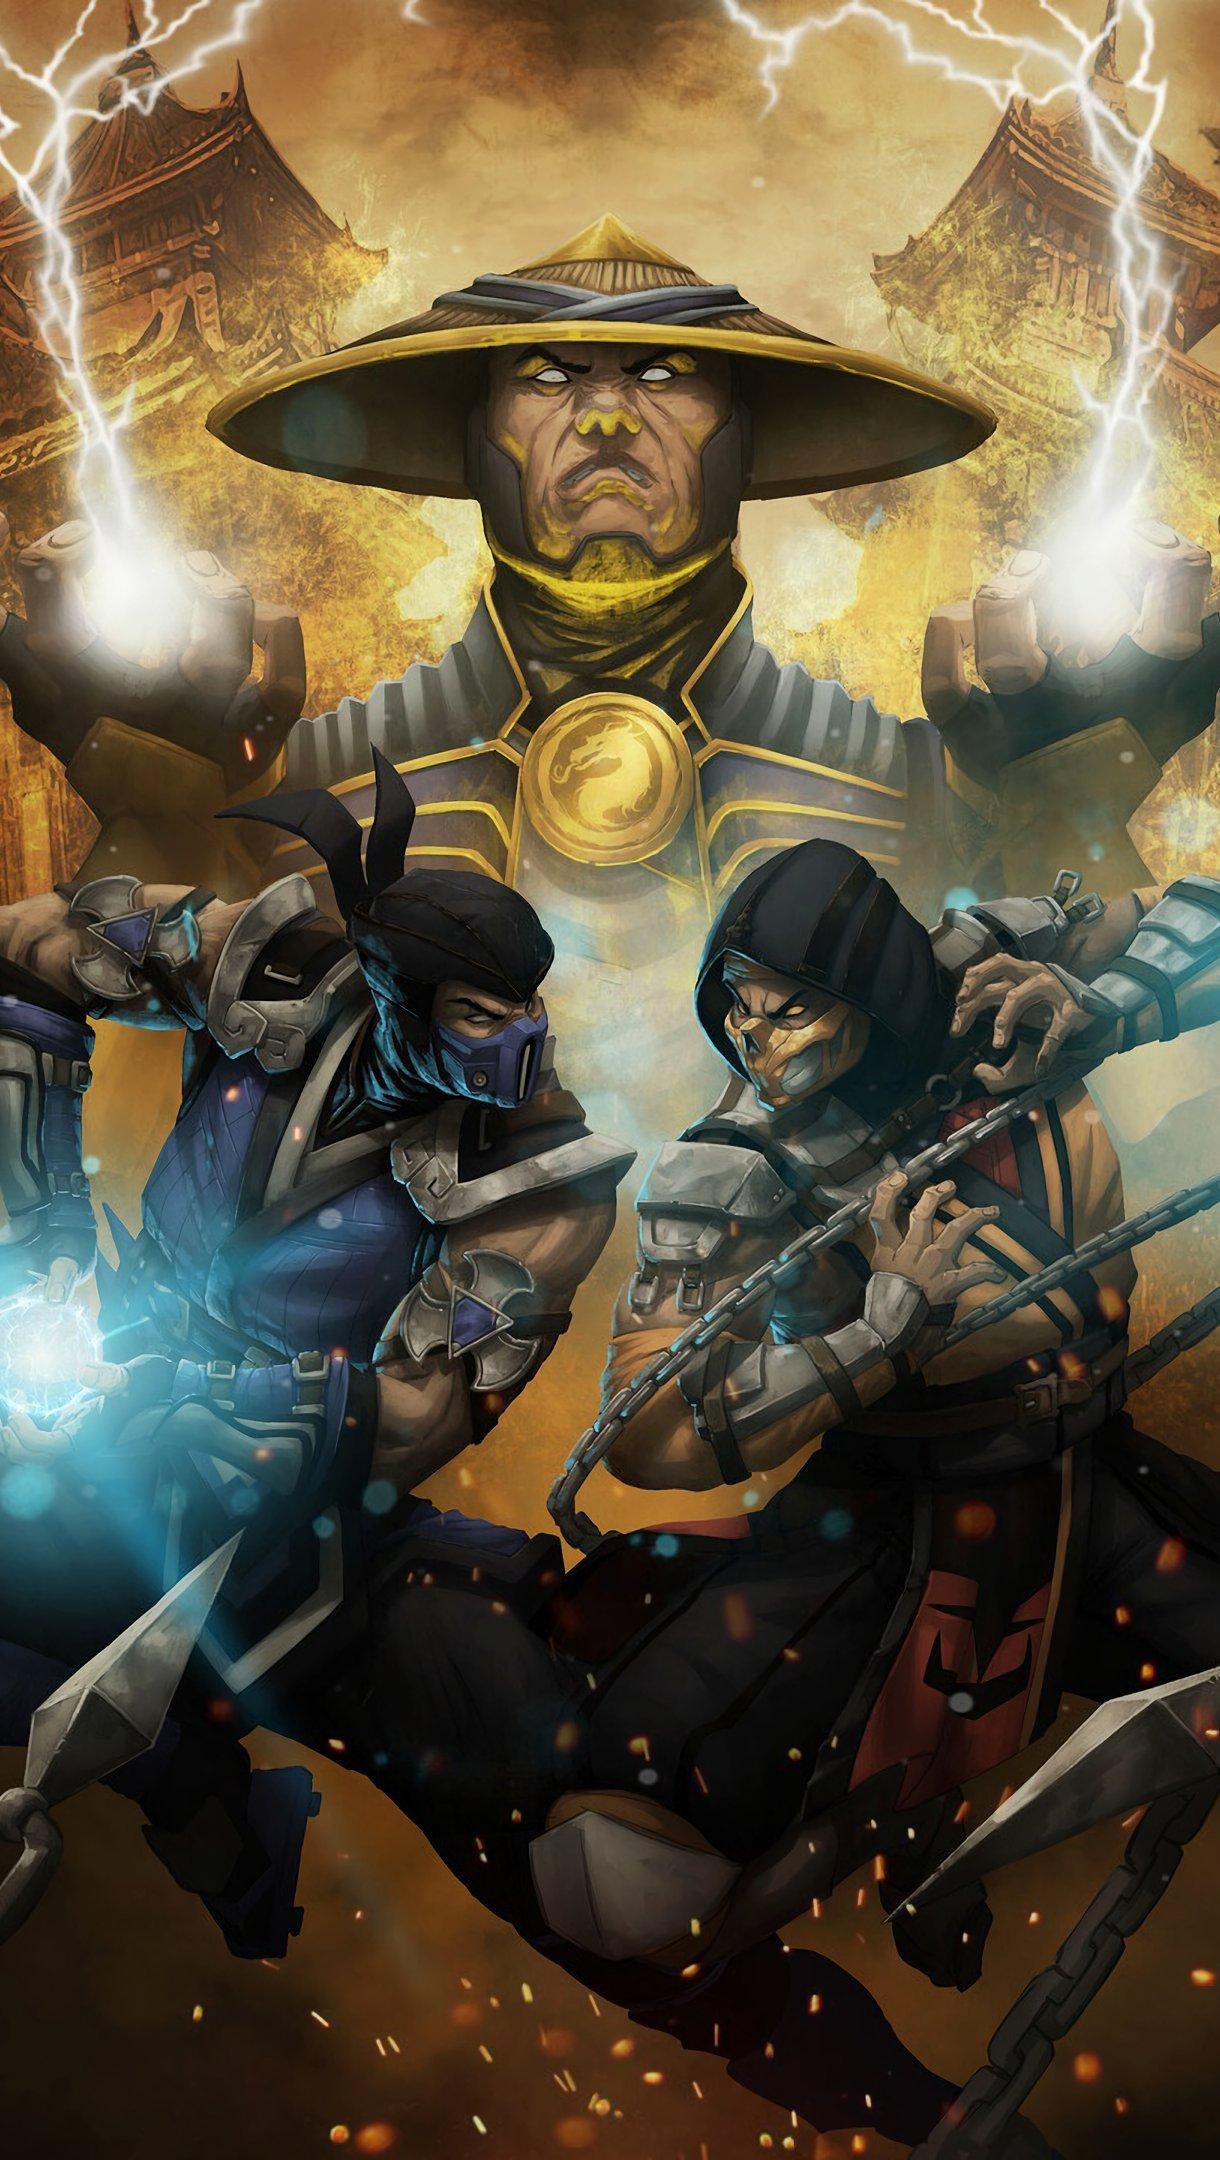 Fondos de pantalla Mortal Kombat Raiden, Subzero y Scorpion Vertical